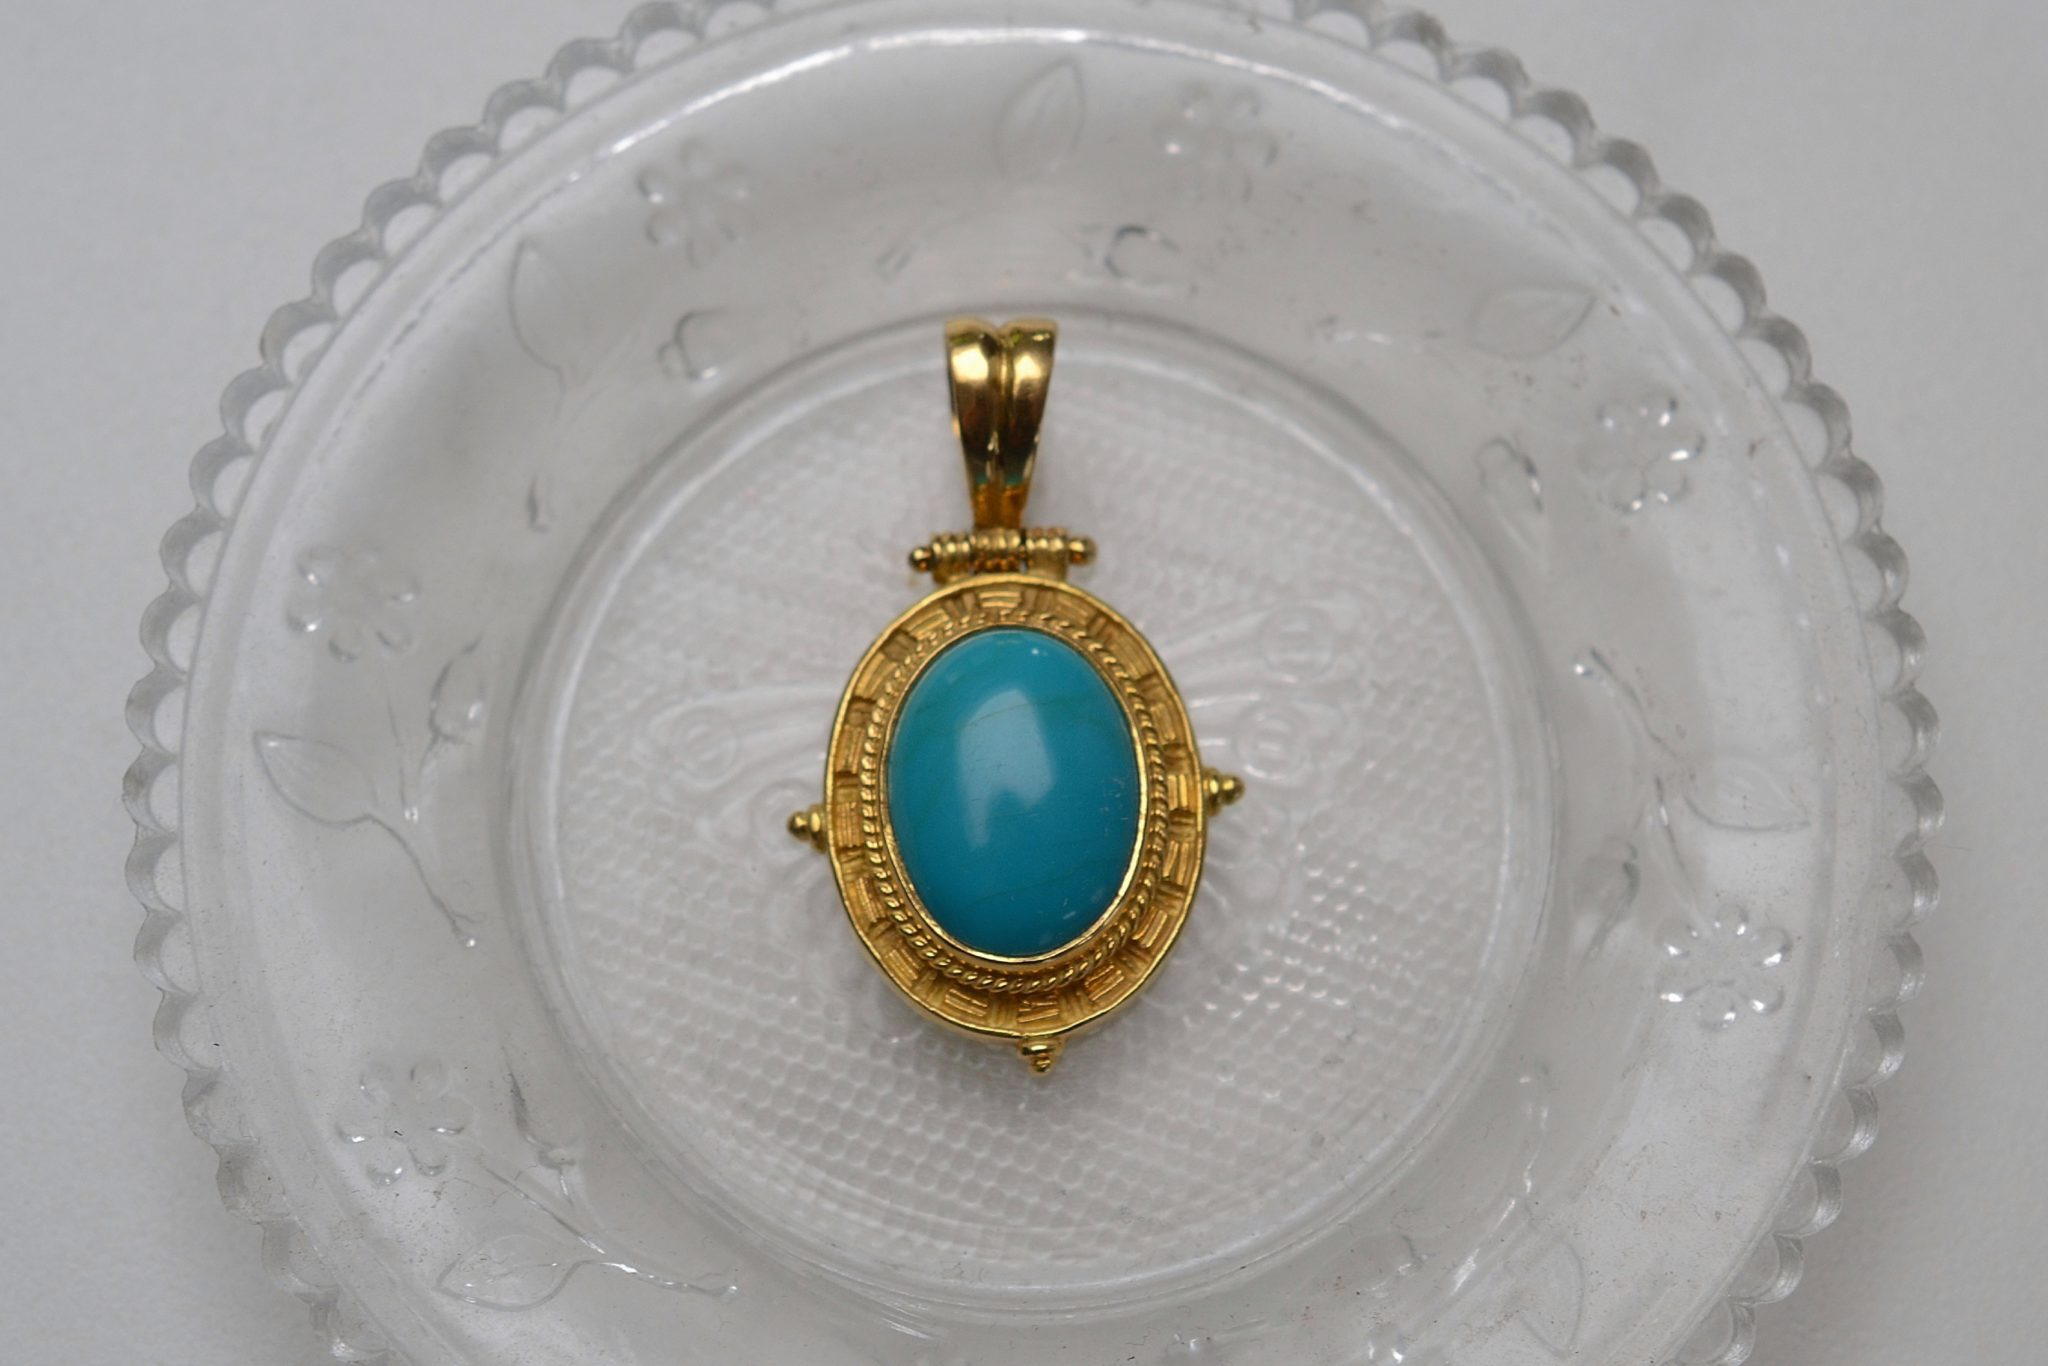 Pendentif En Or Jaune Sertie D_une Turquoise - Bijou Vintage